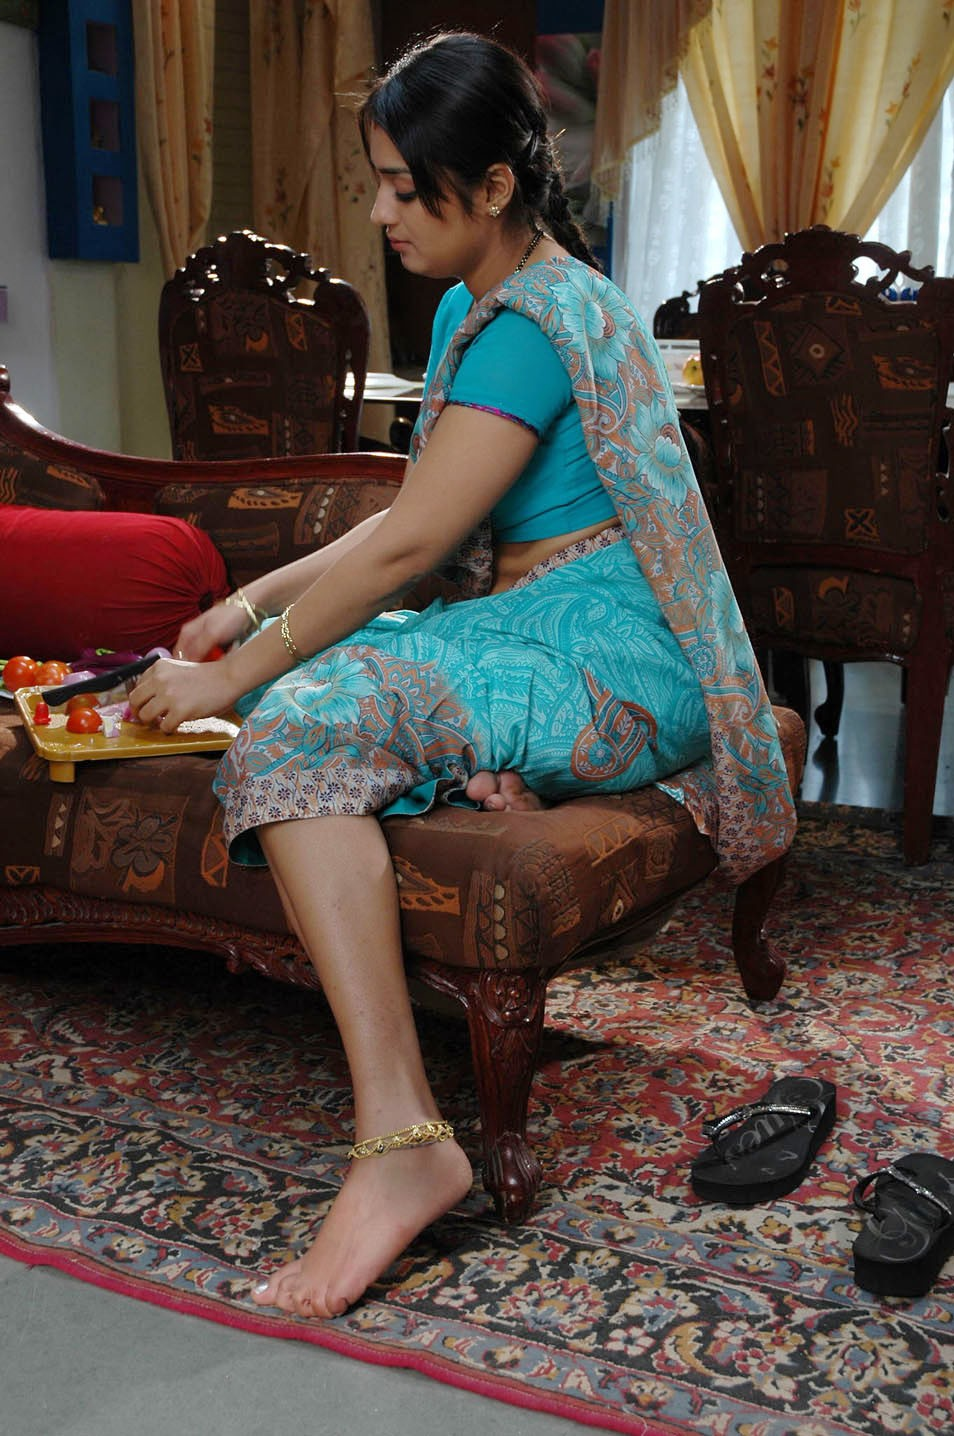 Indian Anklet Feet Porn Videos  Pornhubcom